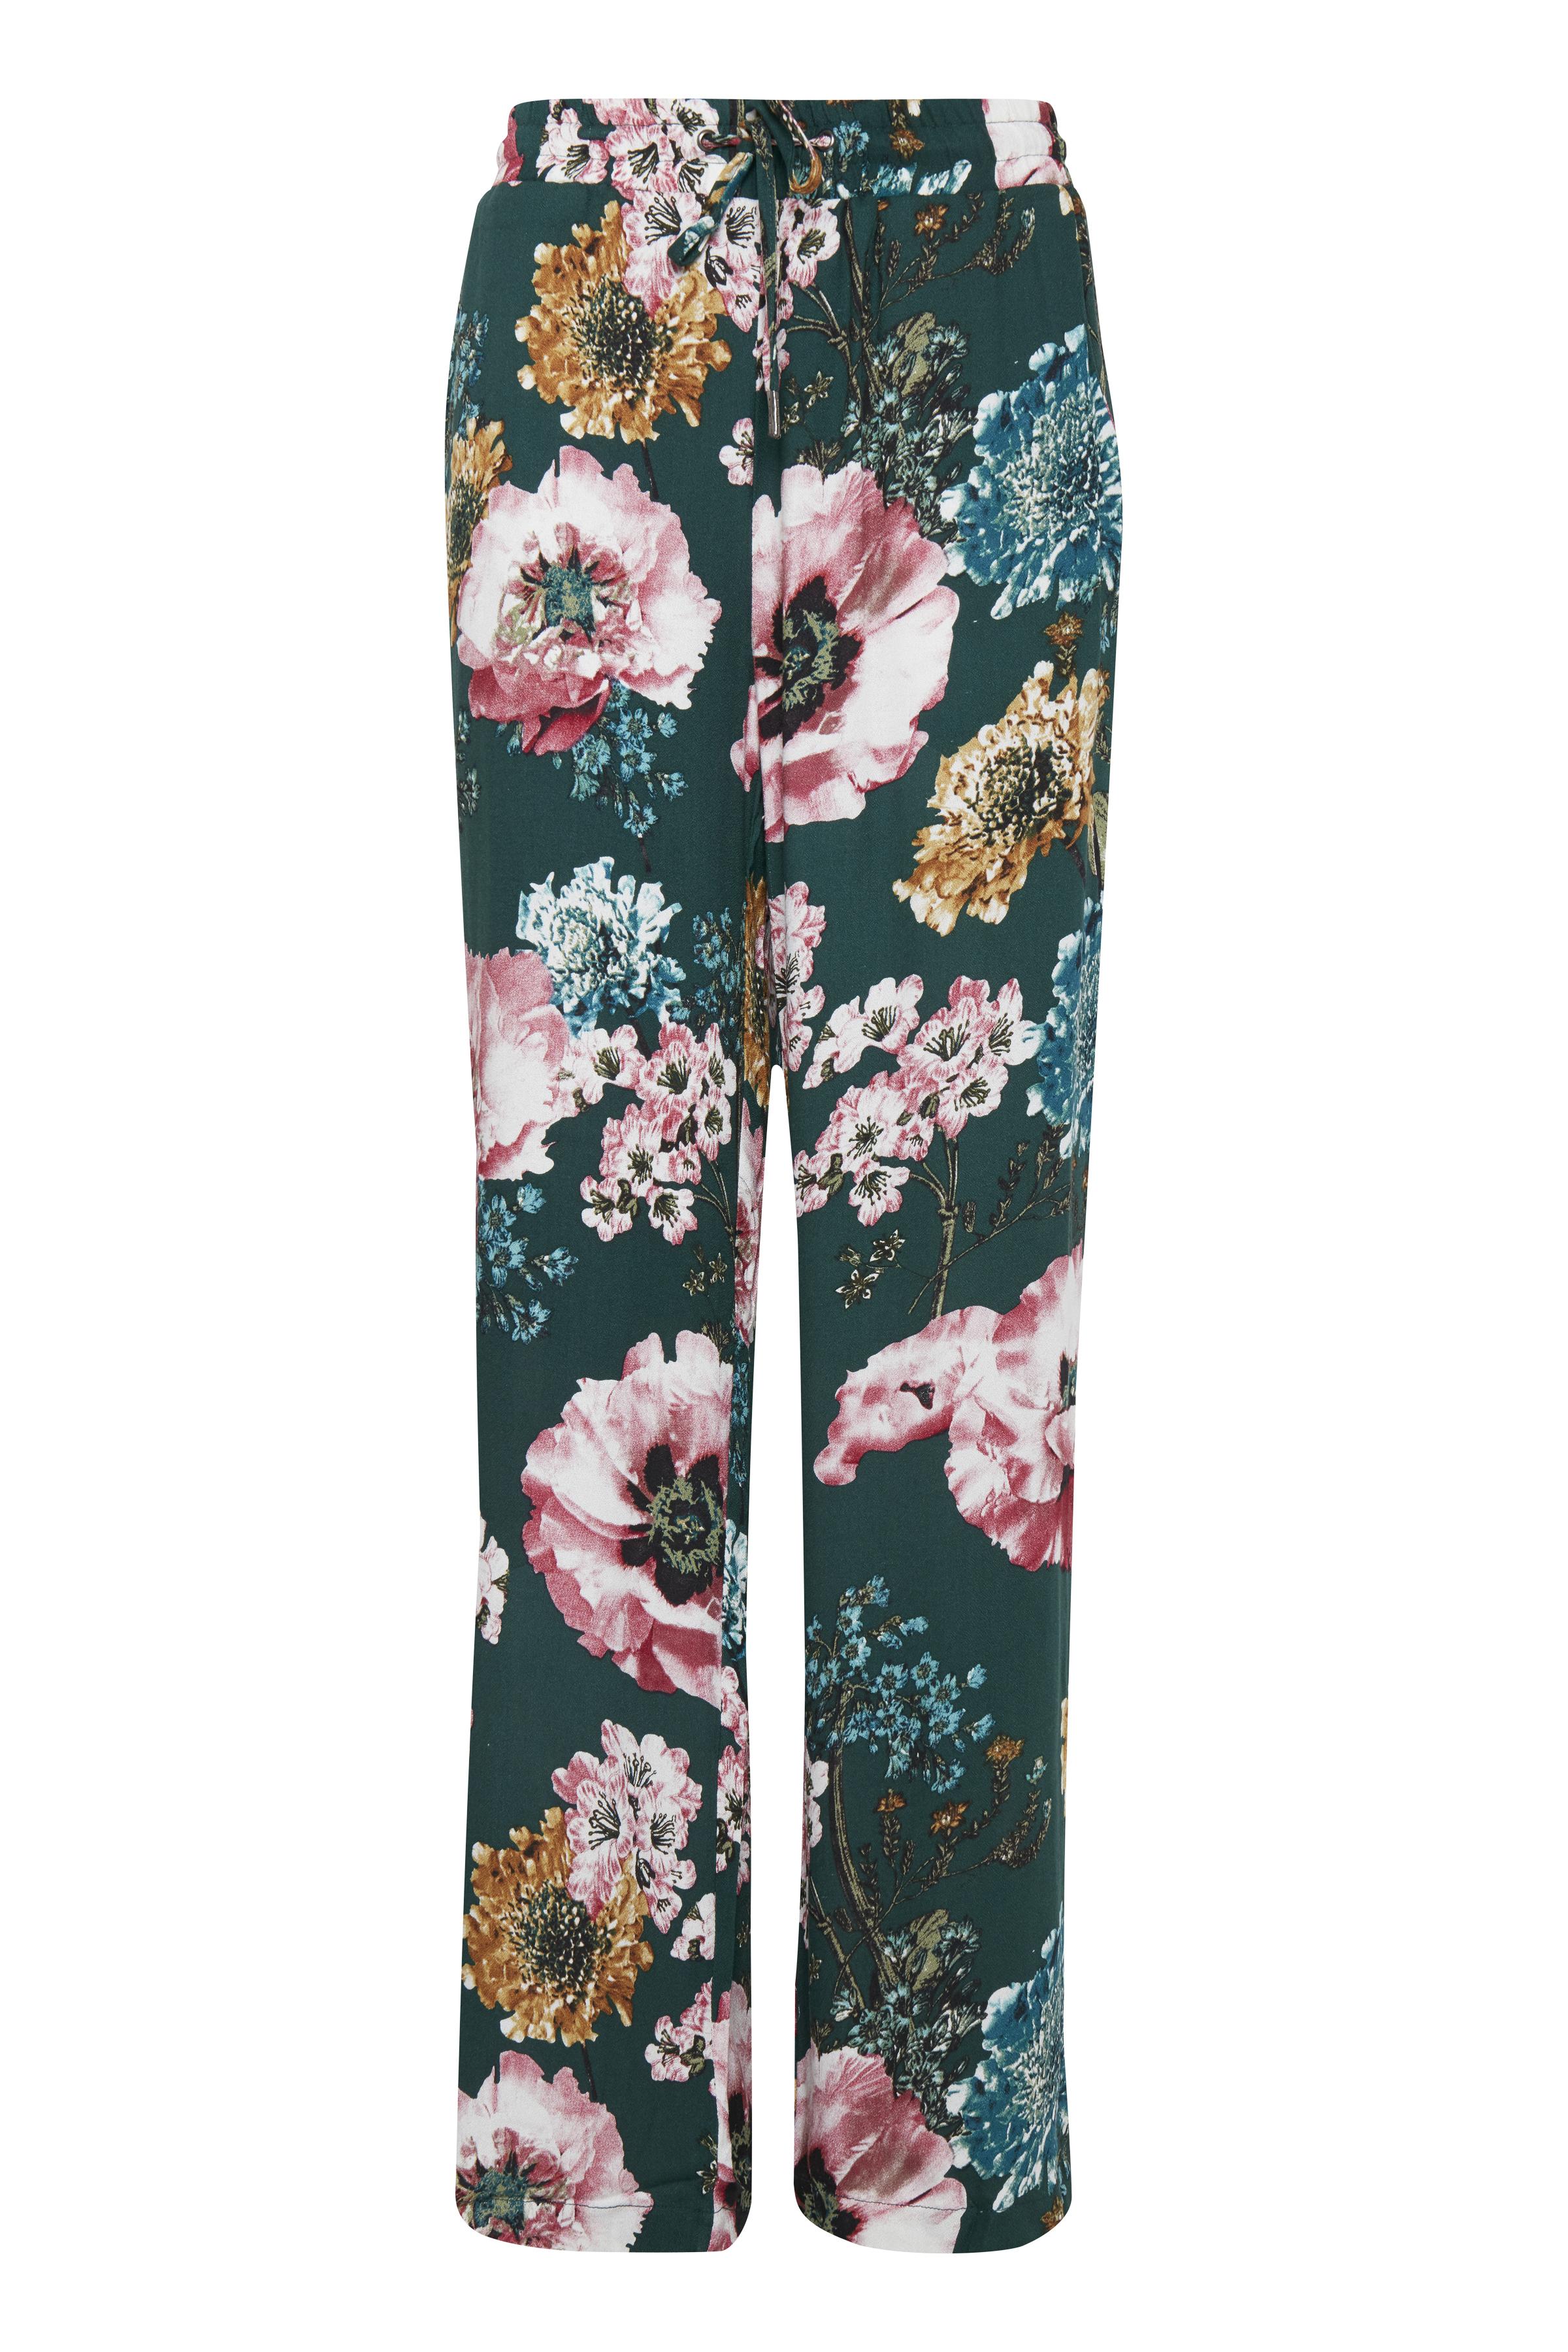 Flaschengrün/rosa Pants Casual von b.young – Kaufen Sie Flaschengrün/rosa Pants Casual aus Größe 36-44 hier